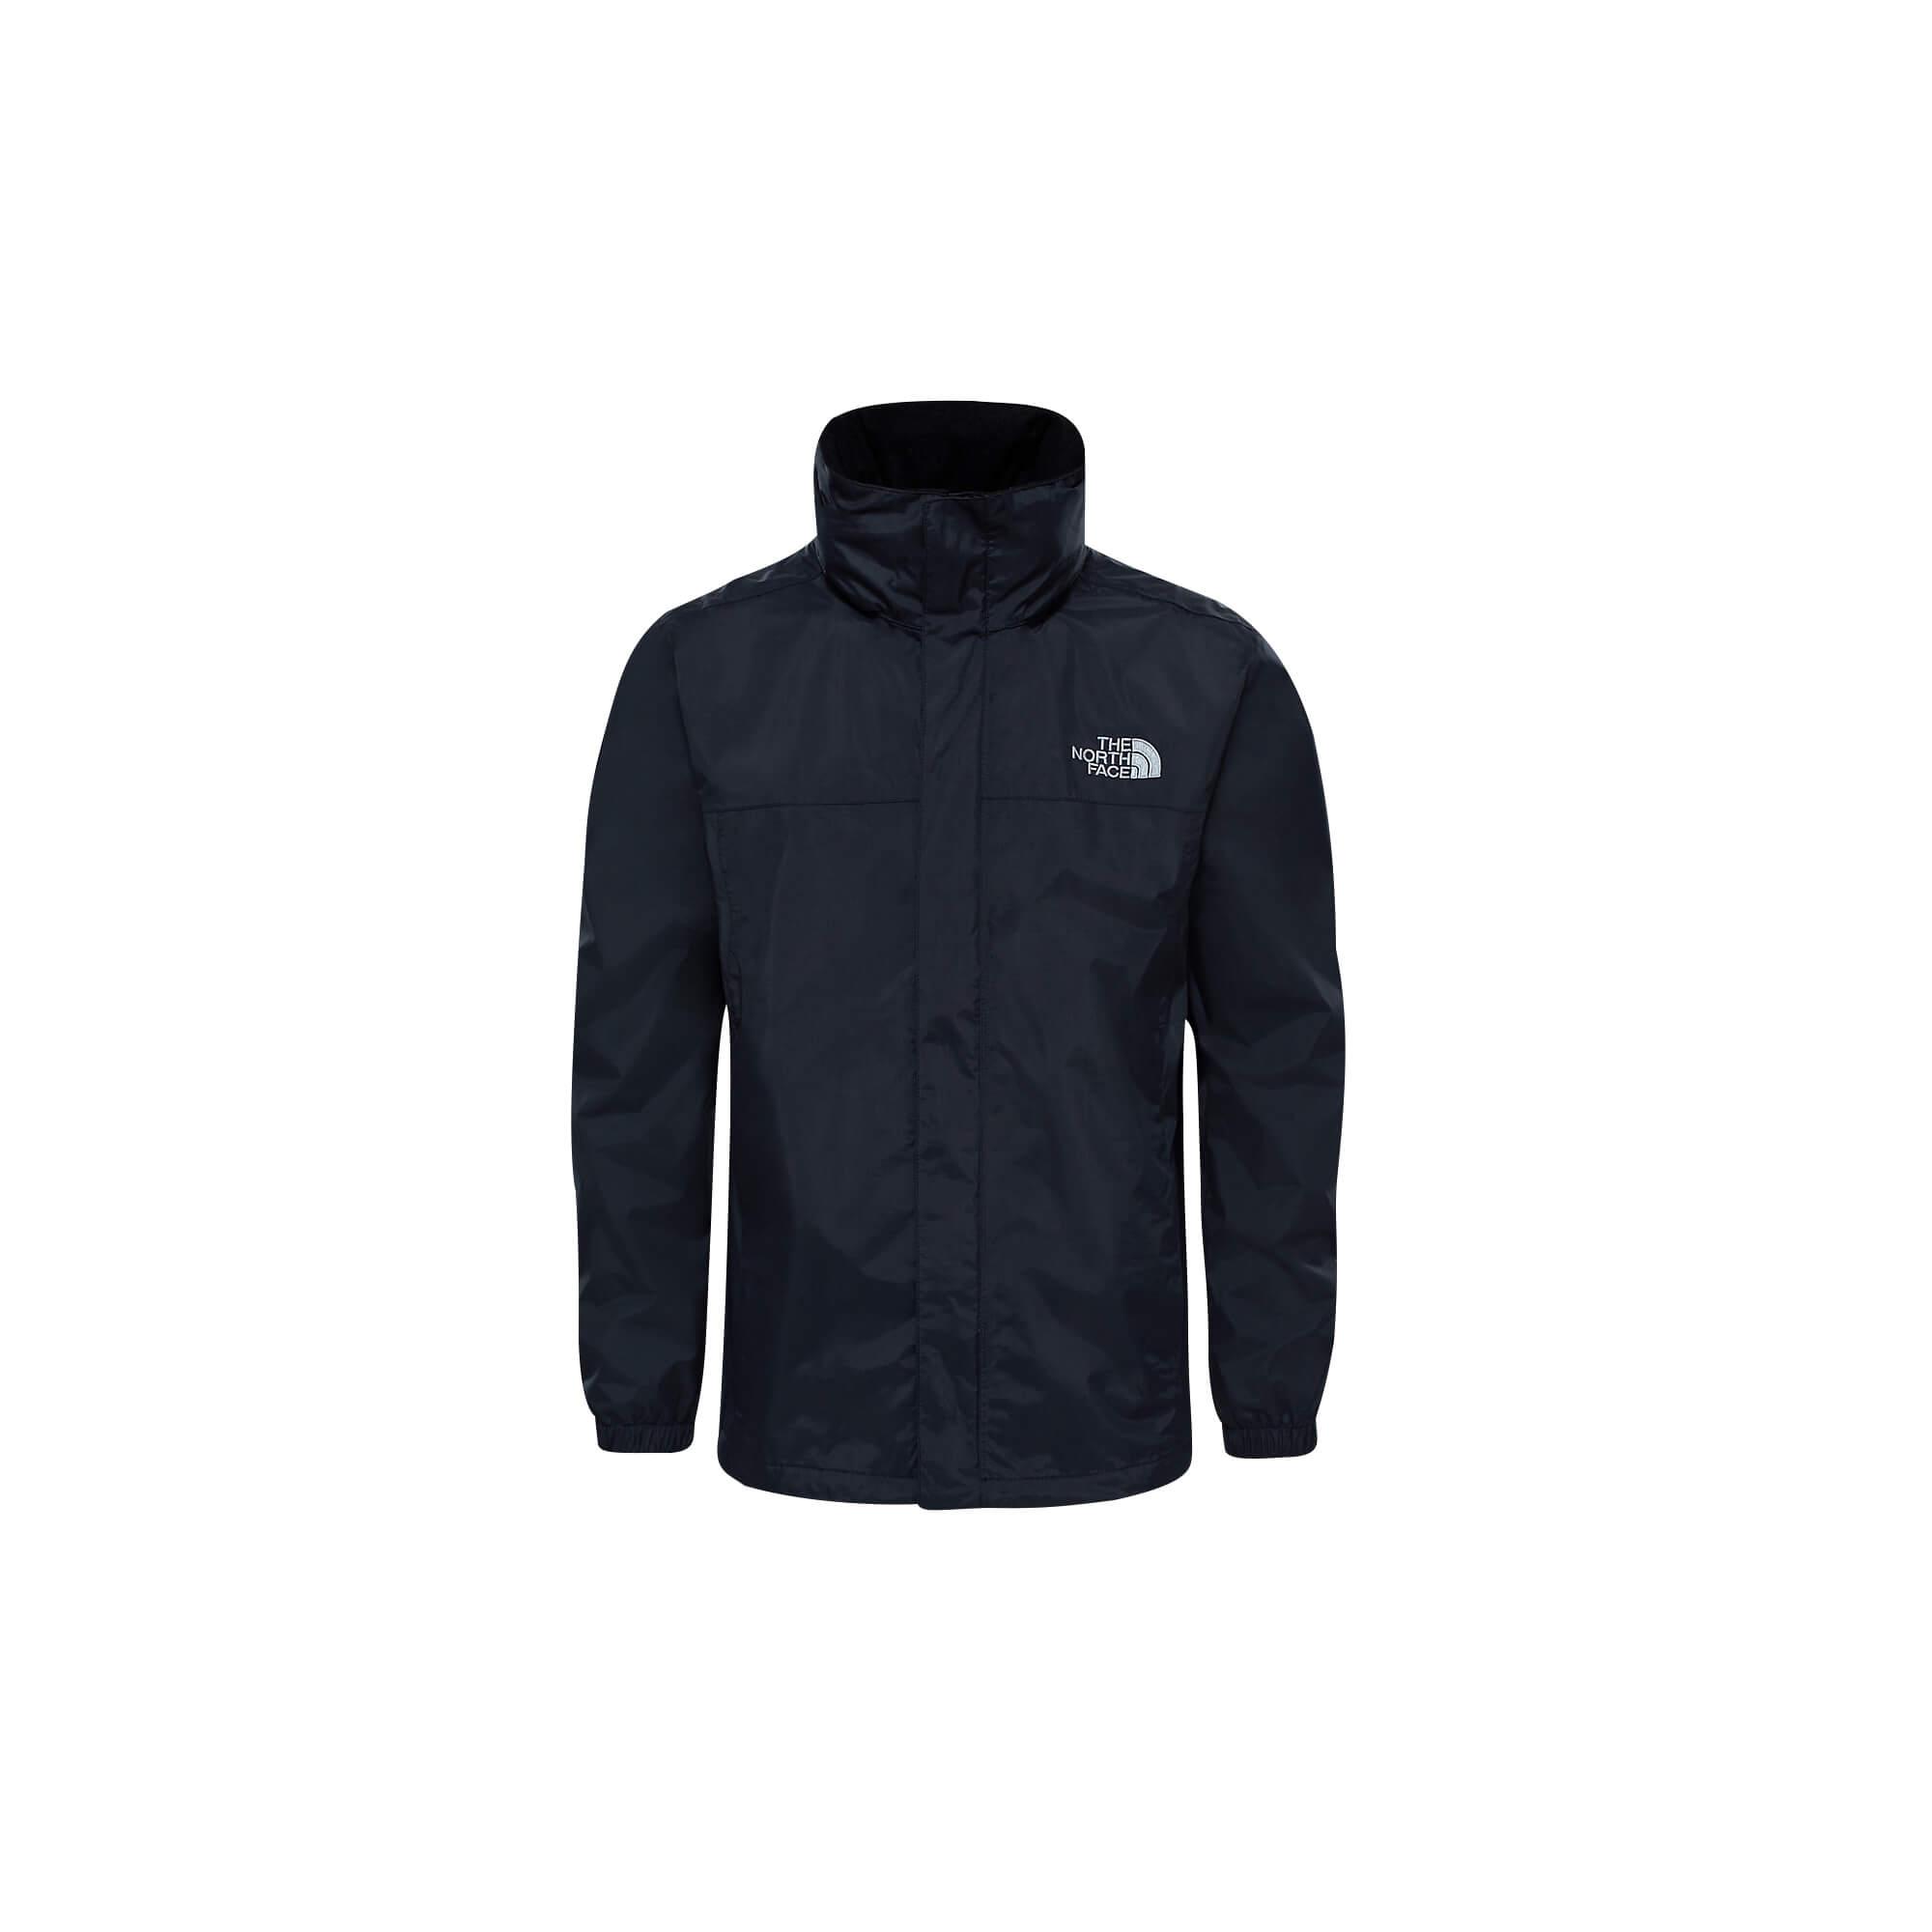 Jacheta impermeabila pentru barbati imagine